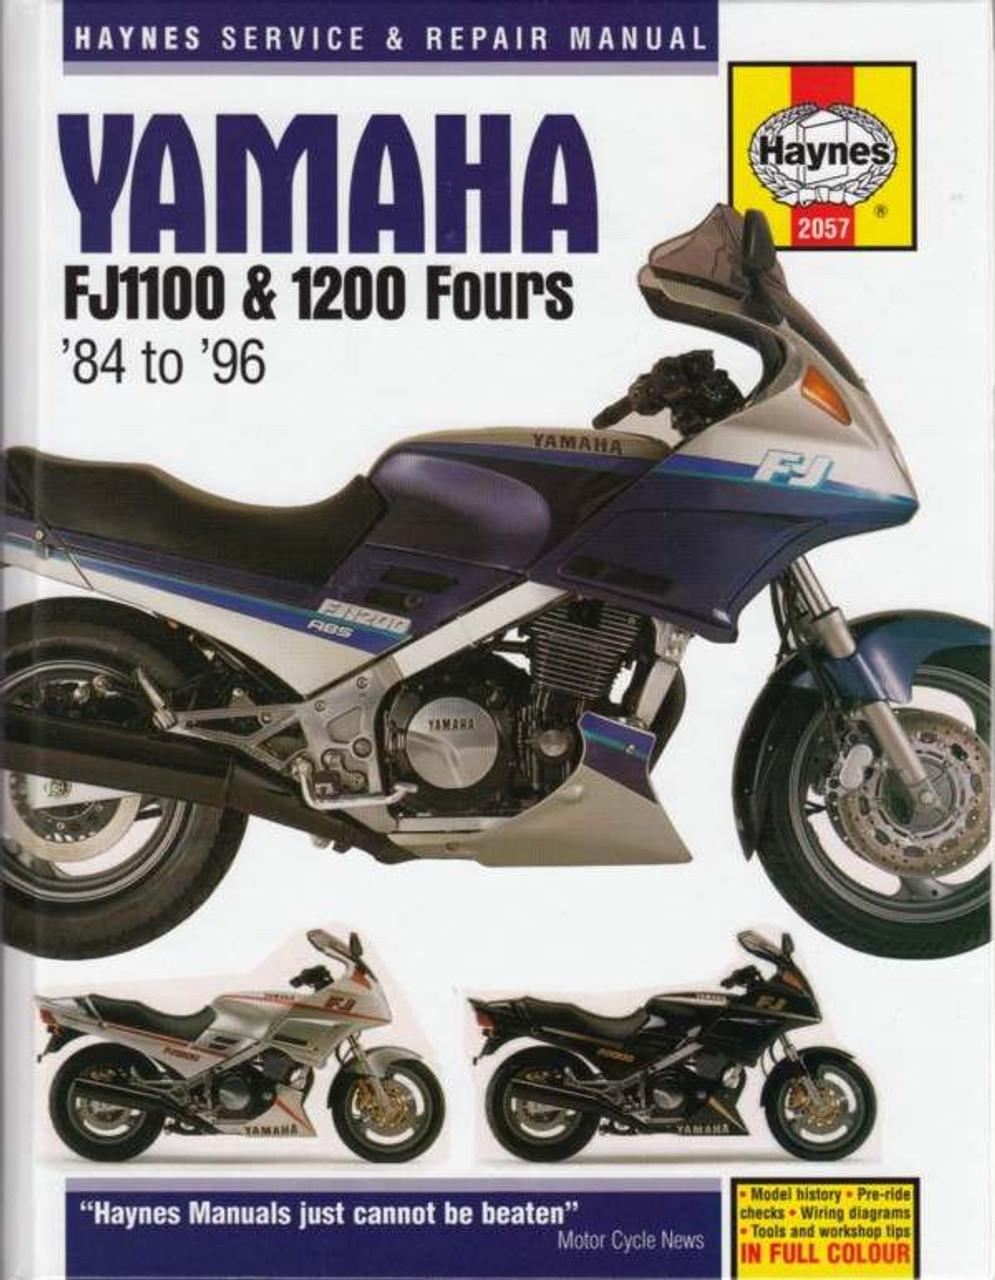 fj1200 service manual